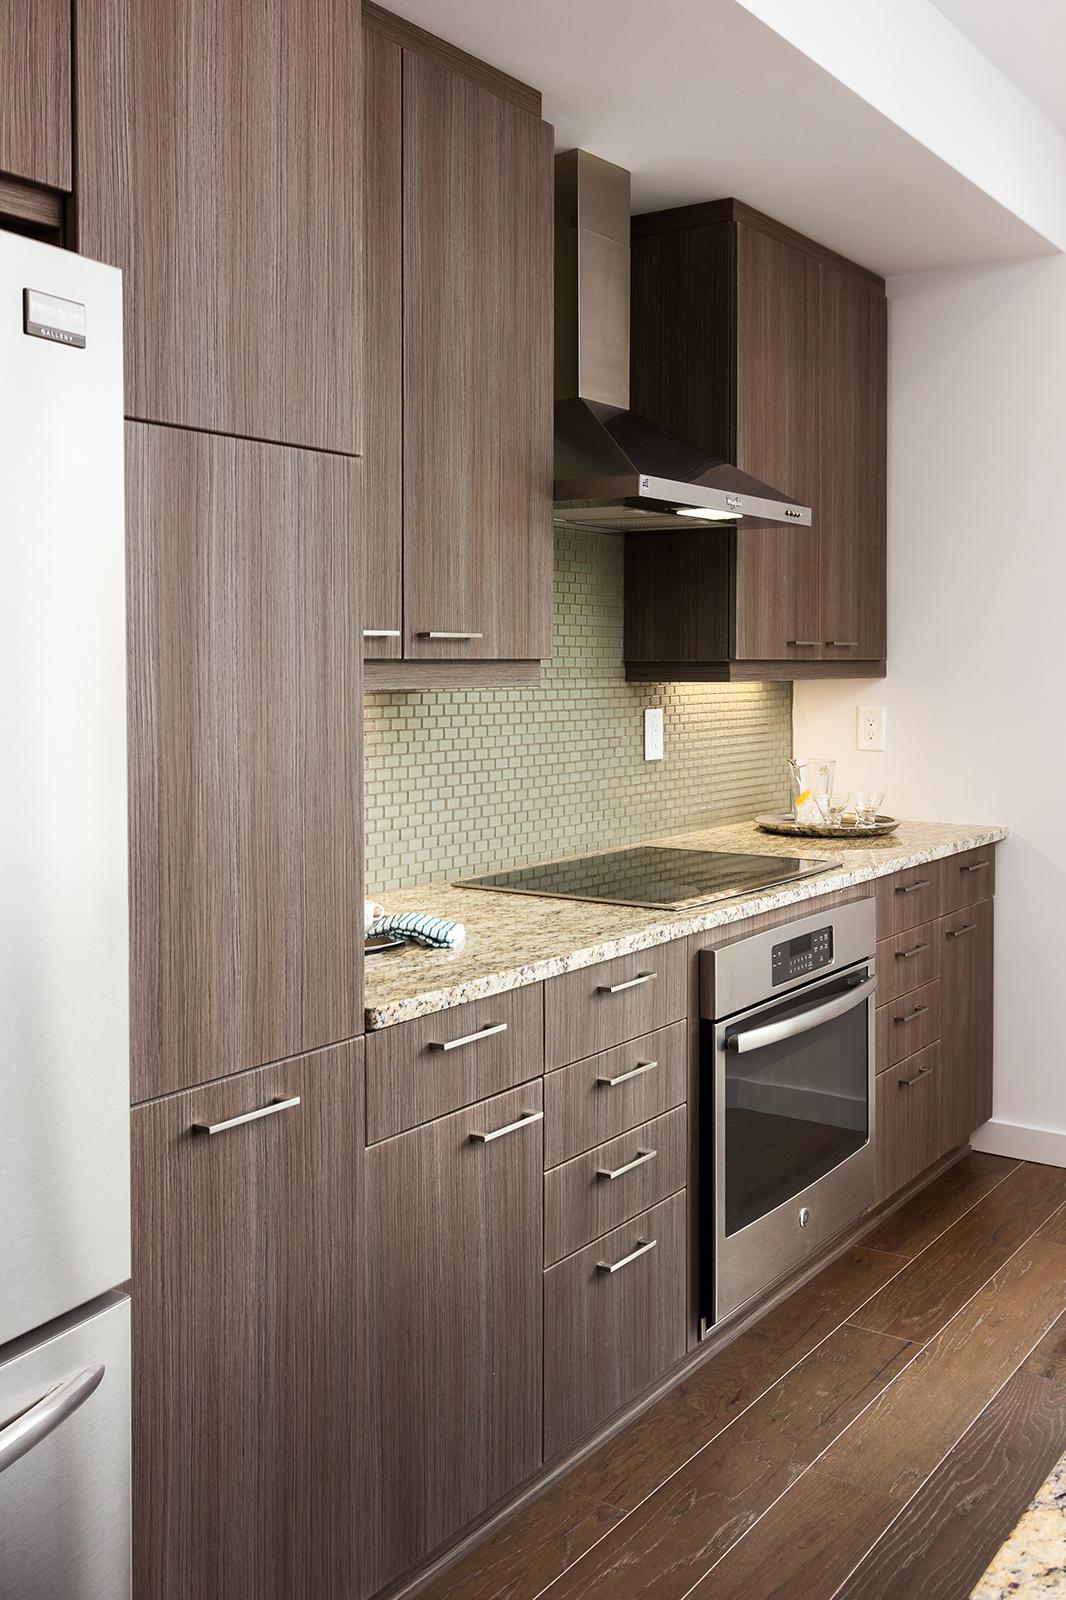 021 1307 Axis_Kitchen Detail Vertical.jpg